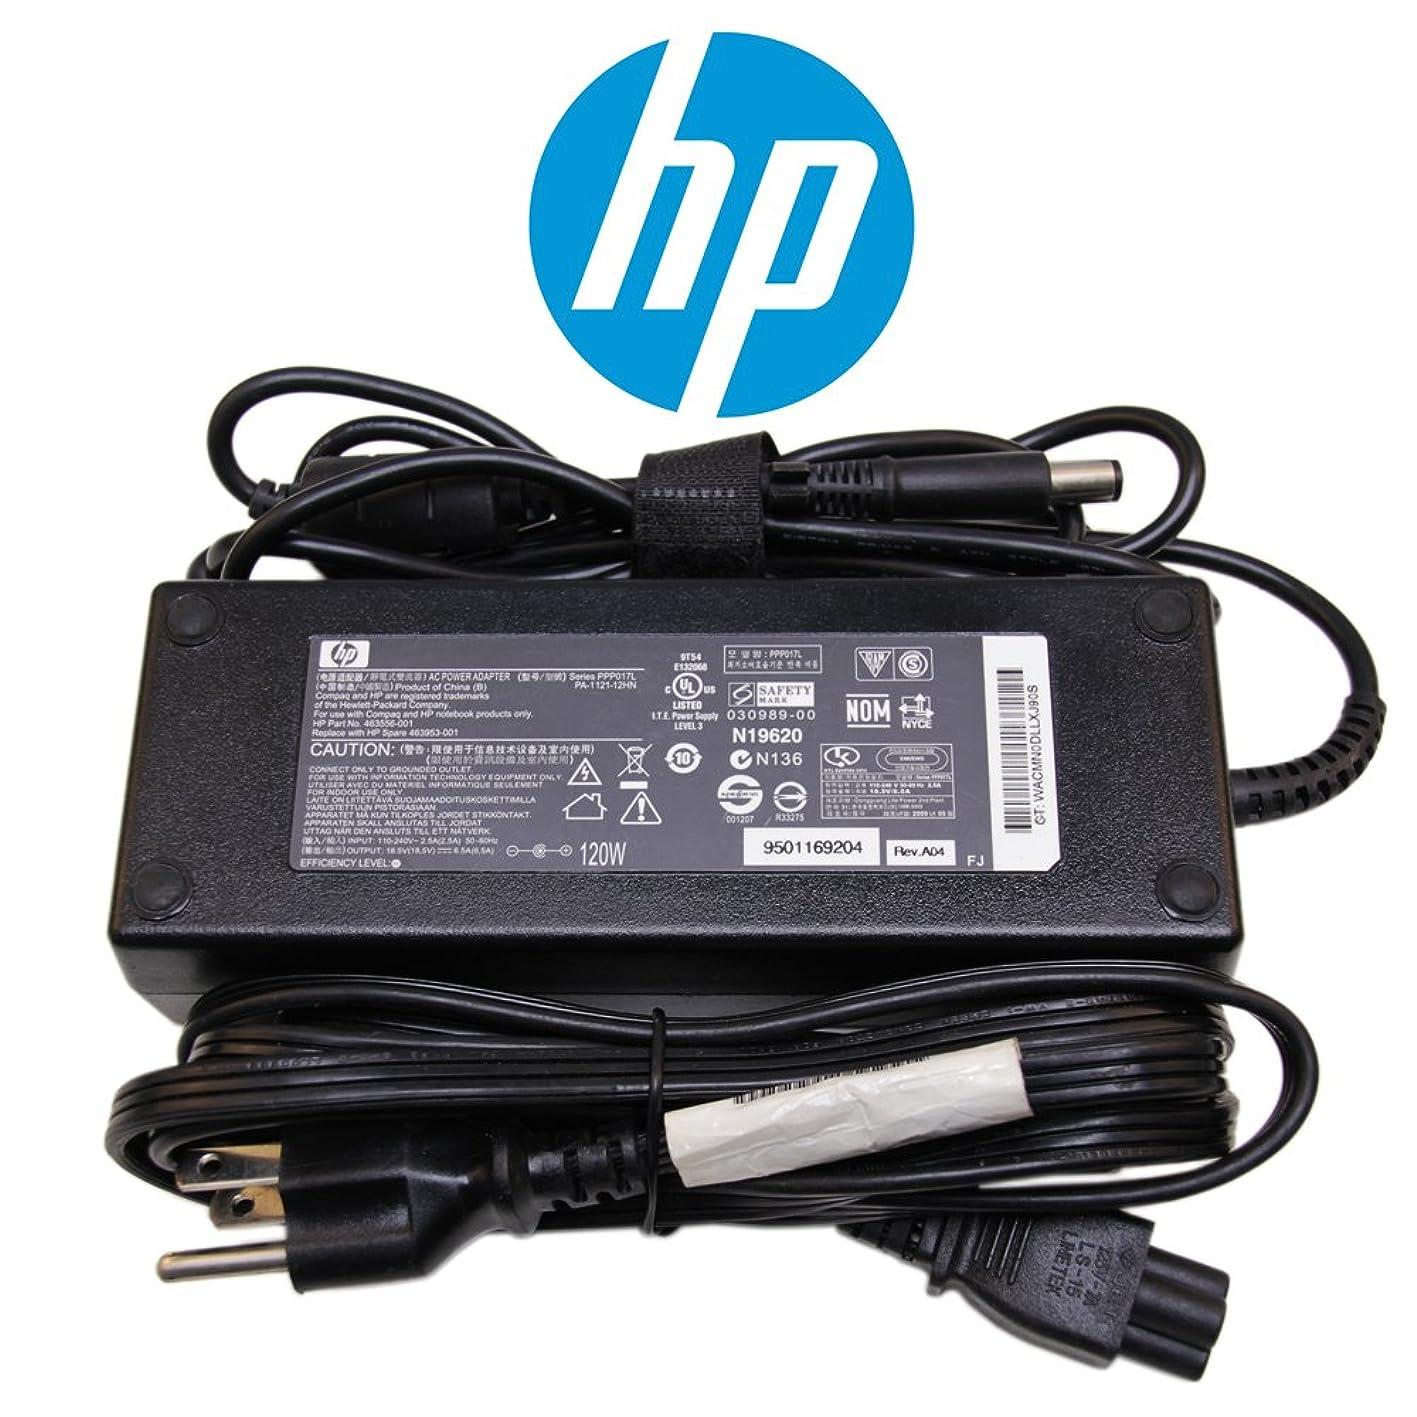 HP Original 120W Laptop Charger for HP Pavilion dv6 dv7 Series Notebook Power-Adapter-Cord fwqbjnpoooj453